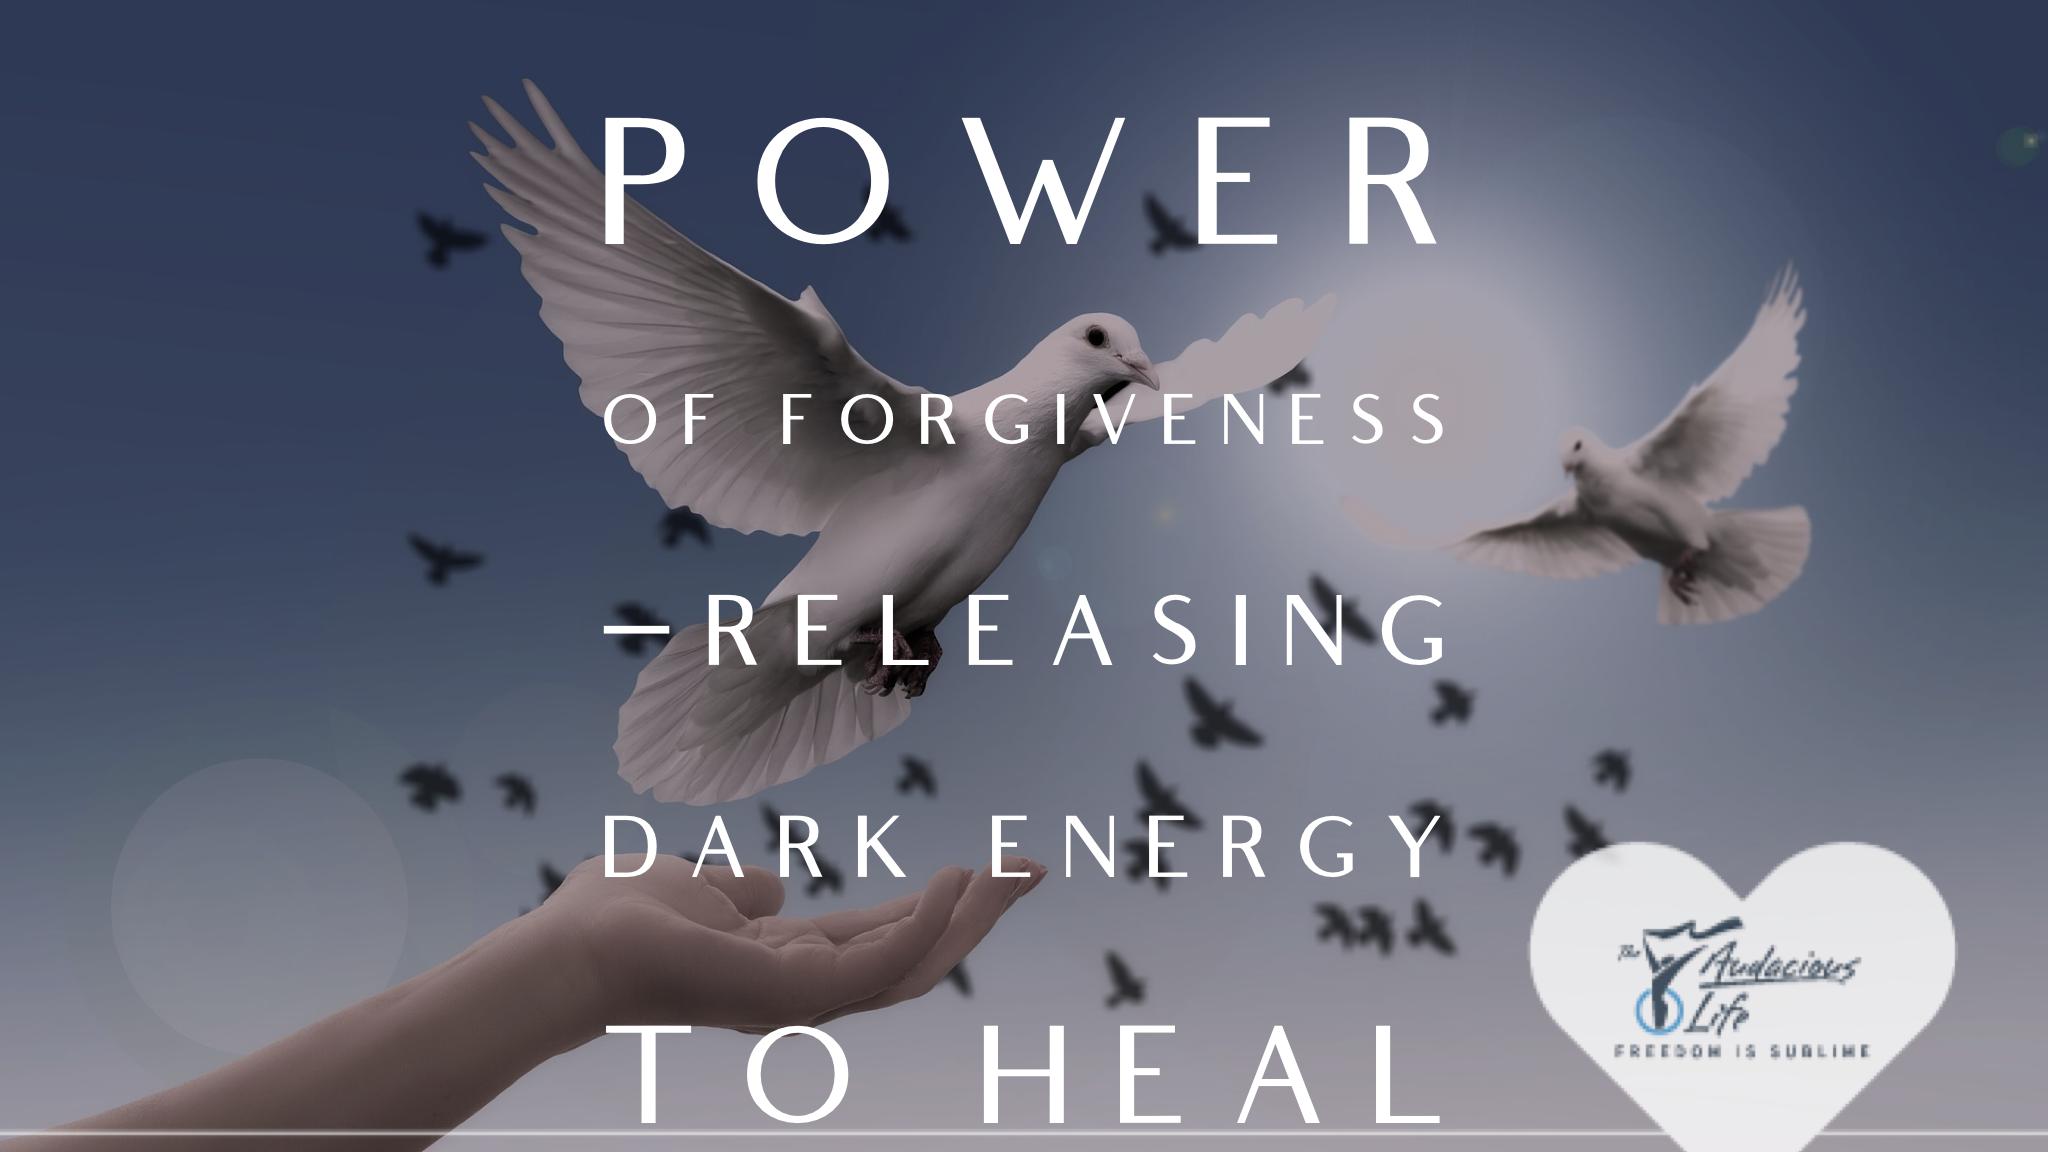 Power of Forgiveness - Releasing Dark Energy to Heal